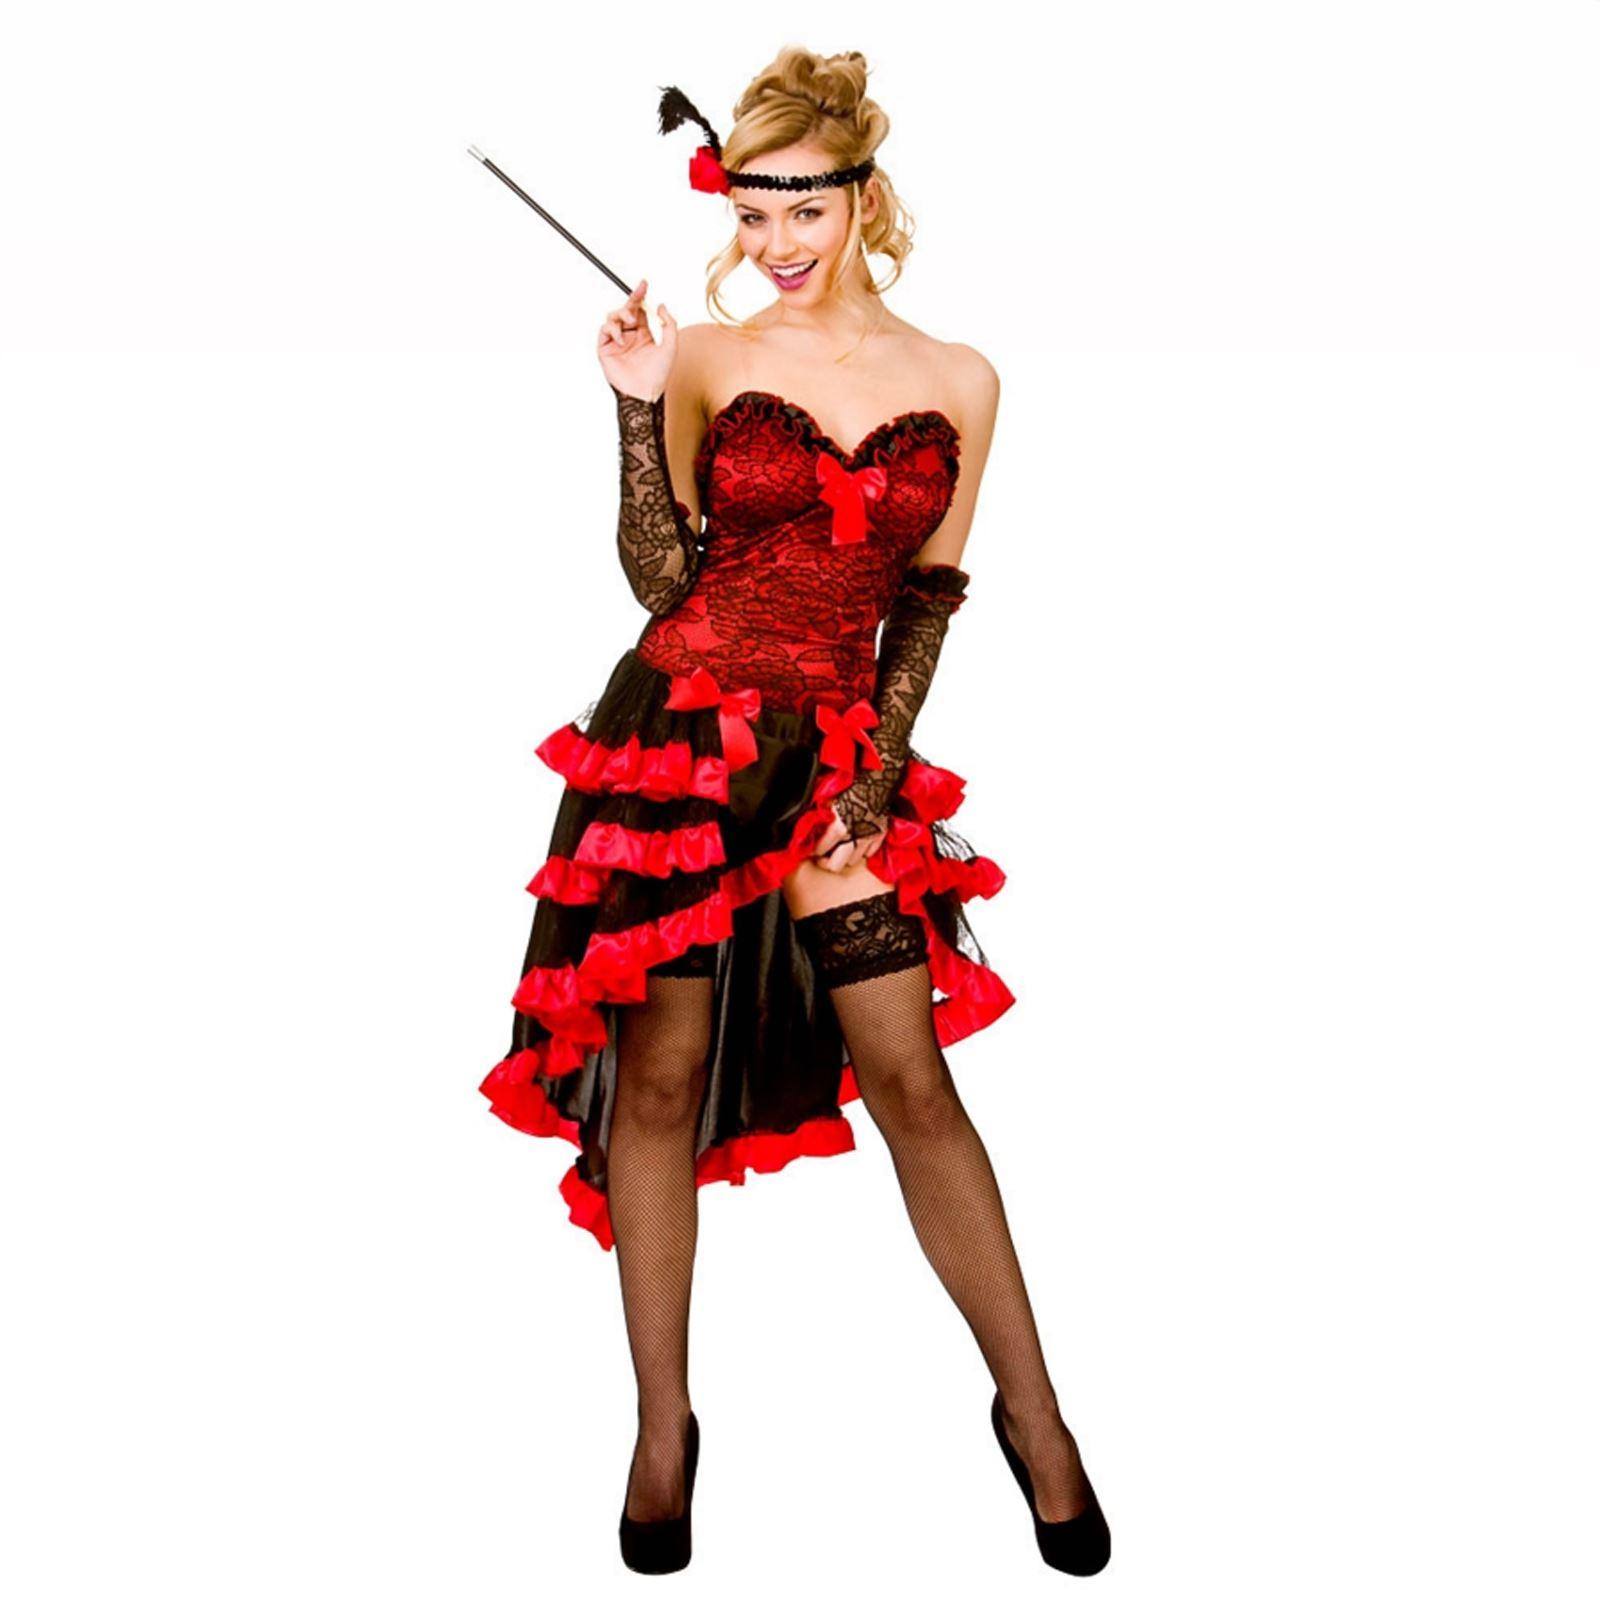 ladies red wild west showgirl saloon girl burlesque fancy dress costume ebay. Black Bedroom Furniture Sets. Home Design Ideas